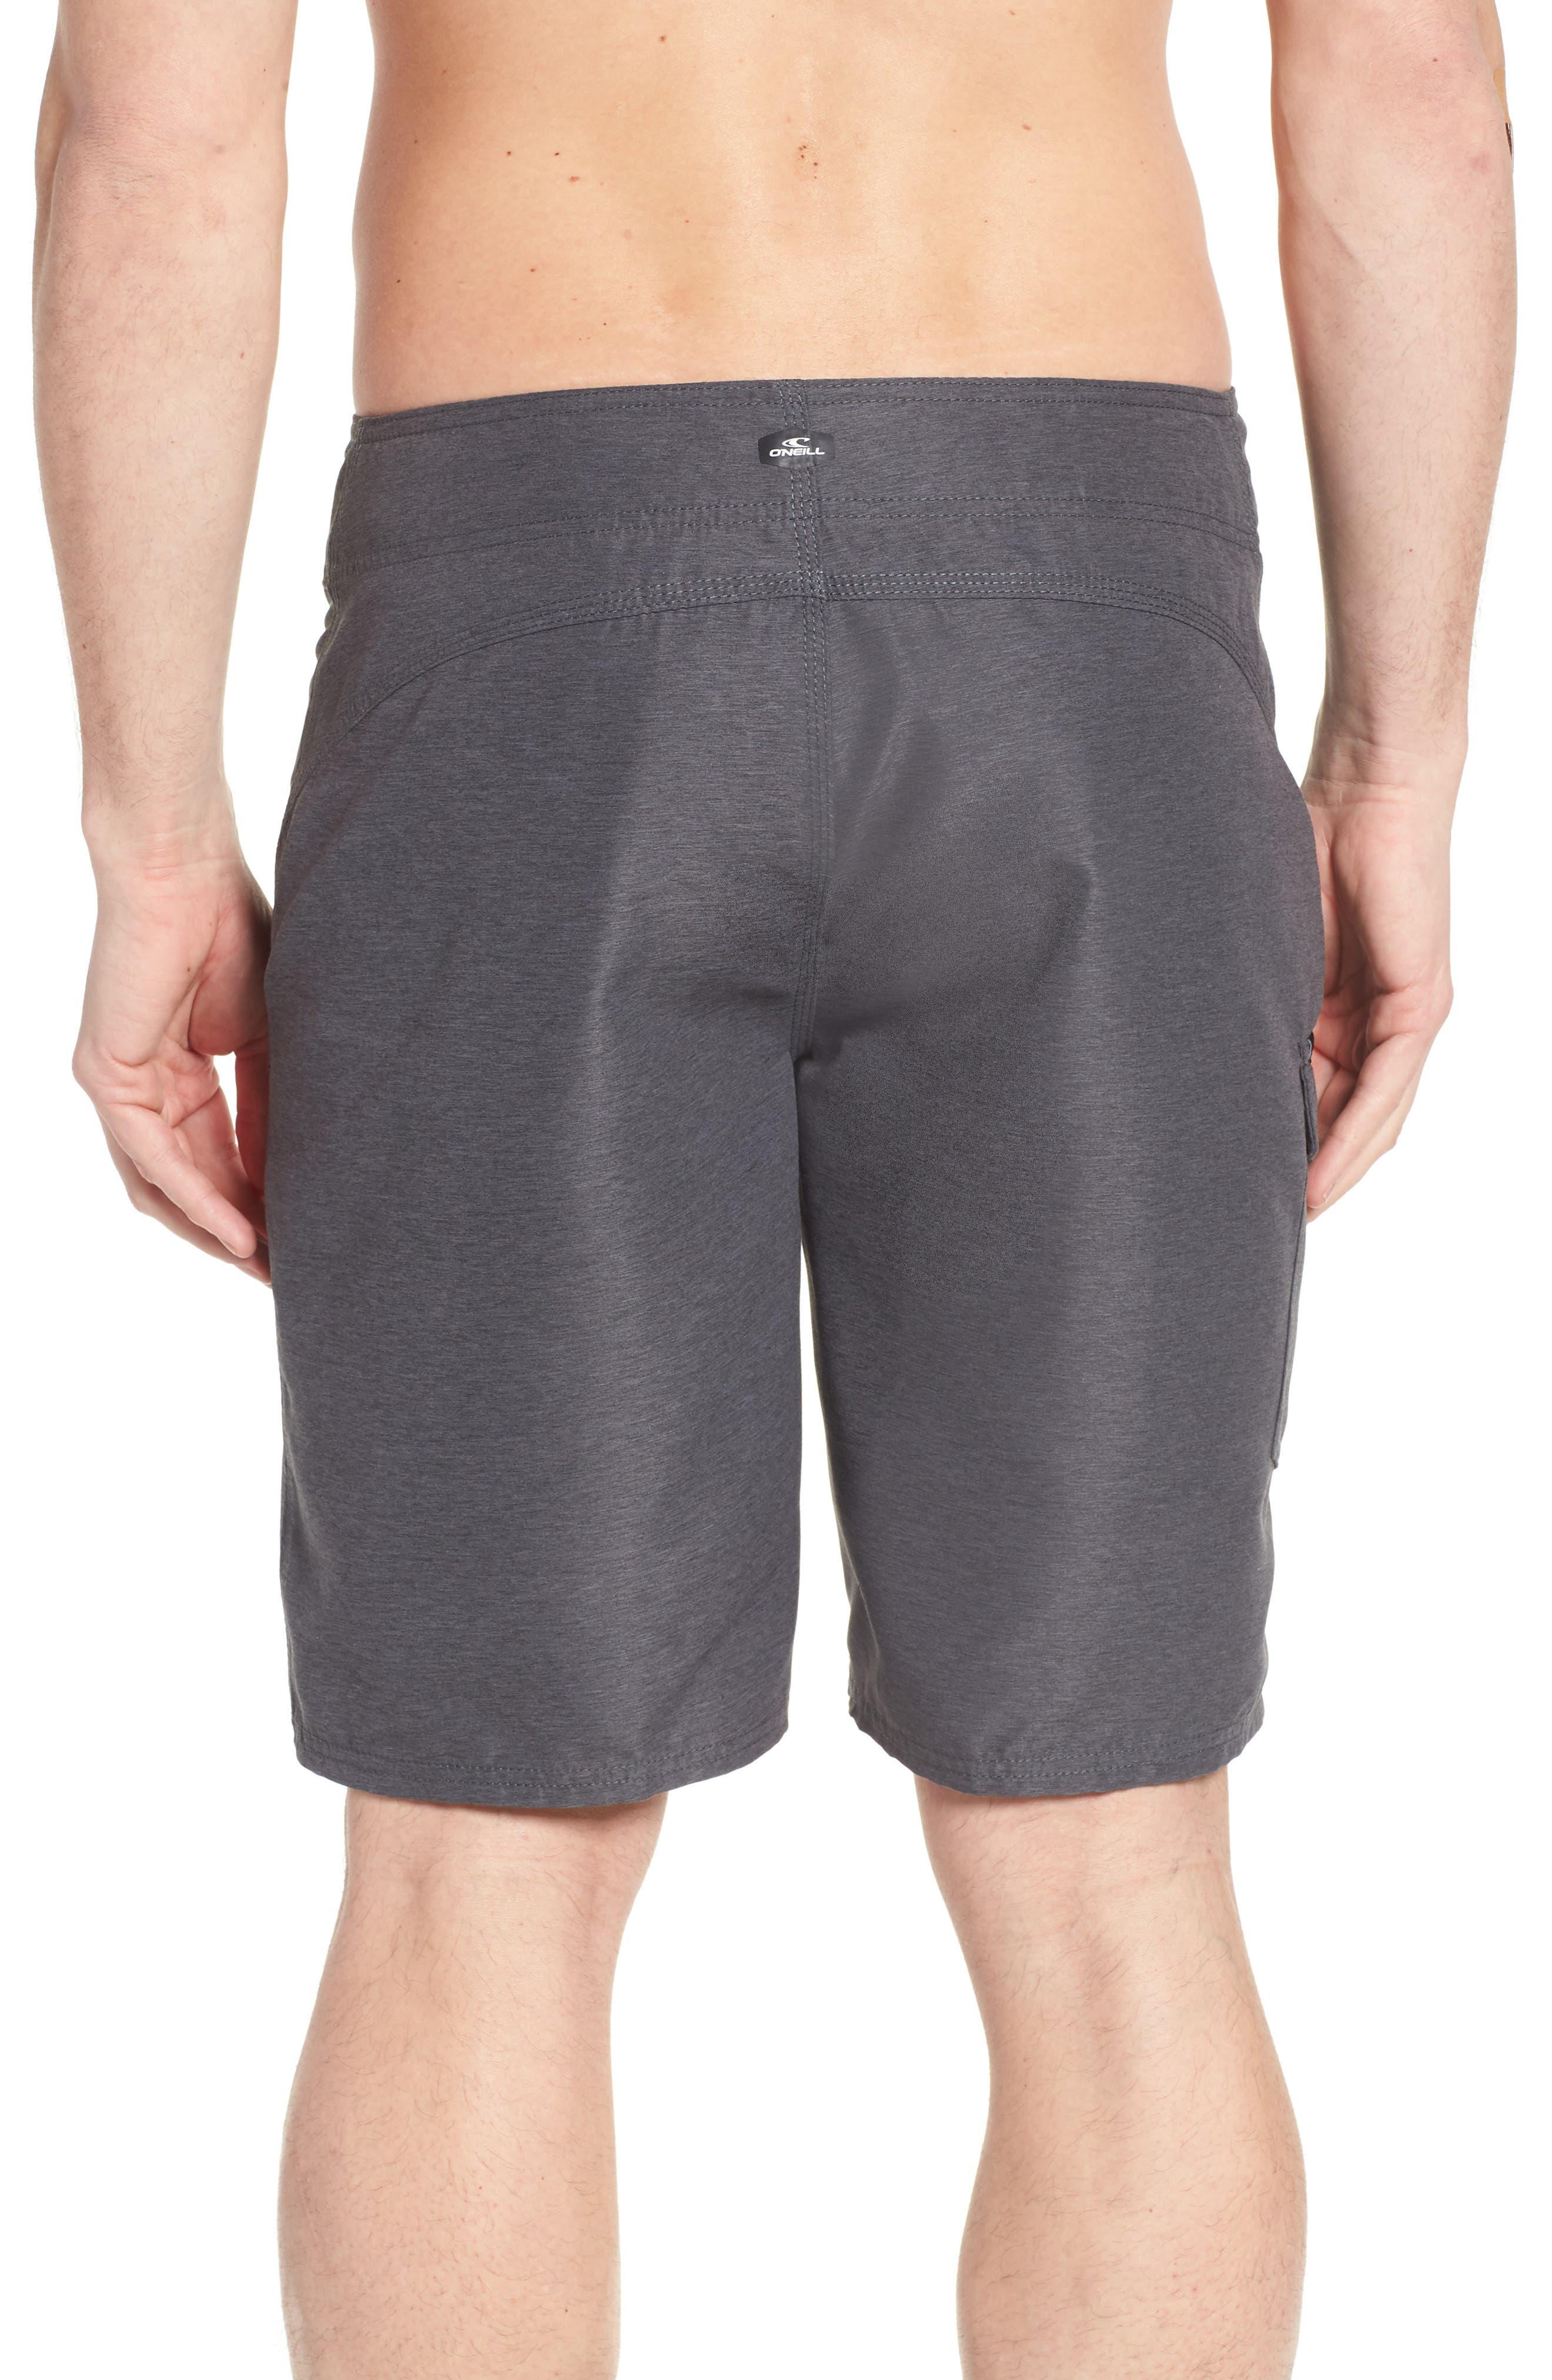 Santa Cruz Board Shorts,                             Alternate thumbnail 2, color,                             001